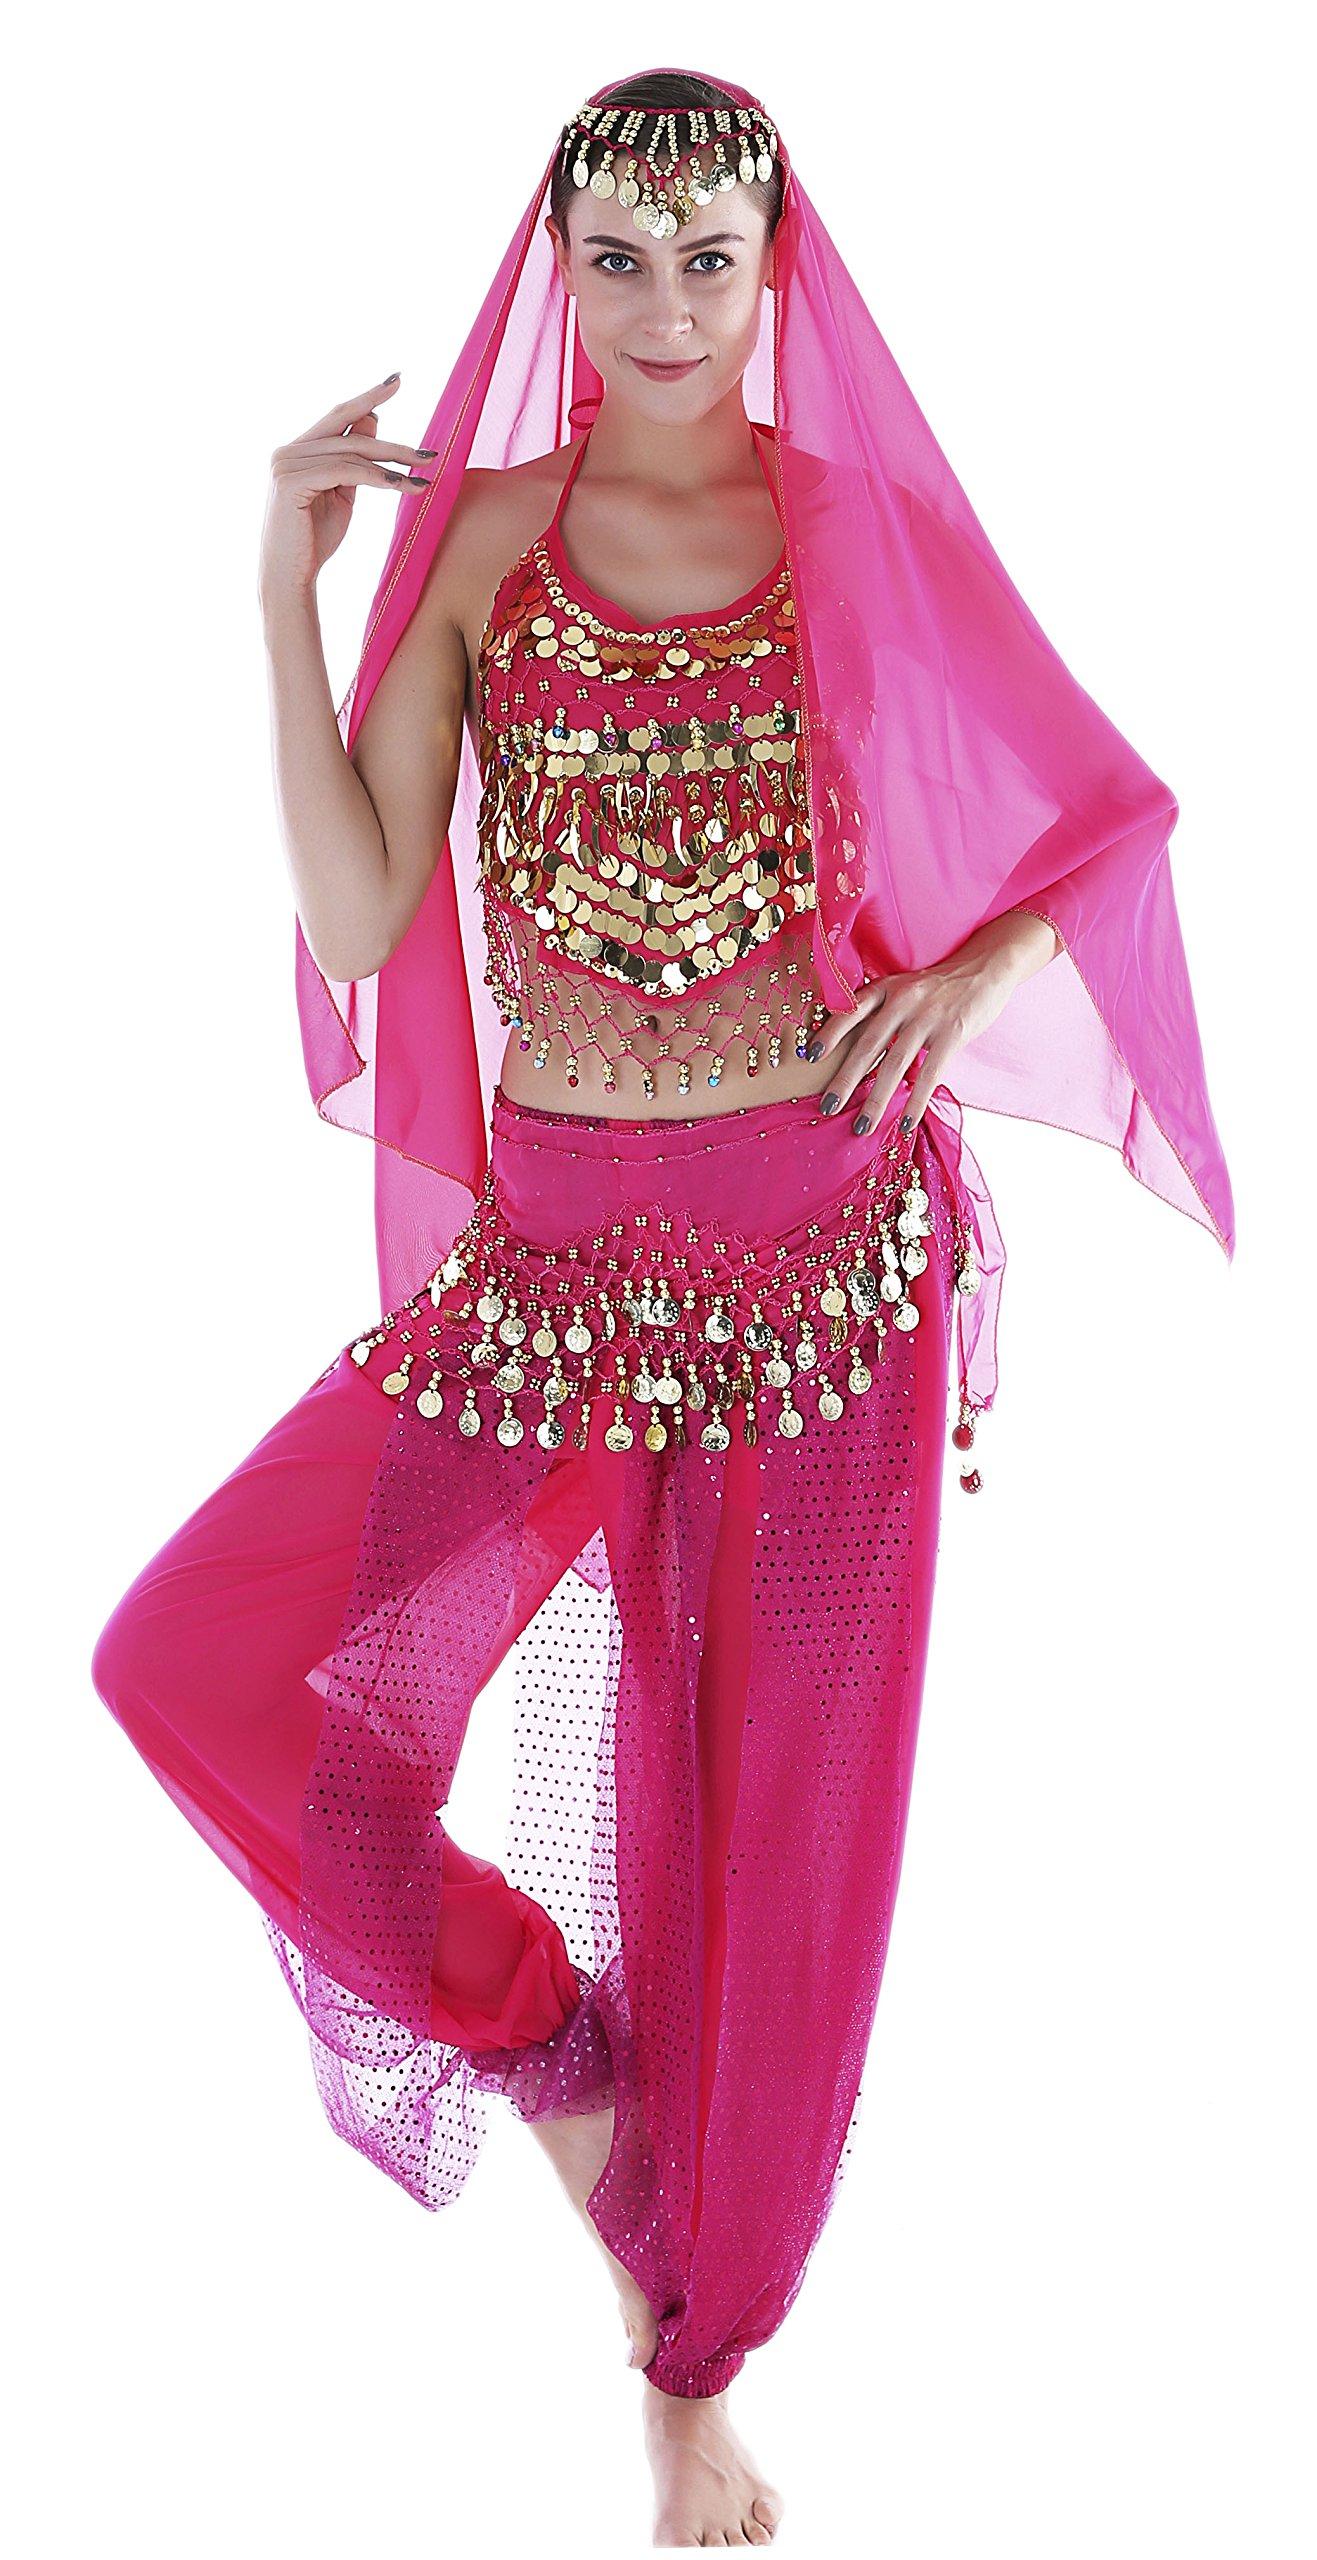 b3118f8f457e Seawhisper-Adult-Genie-Costume-Belly-Dancer-Costumes-for-Women-Hot-Pink